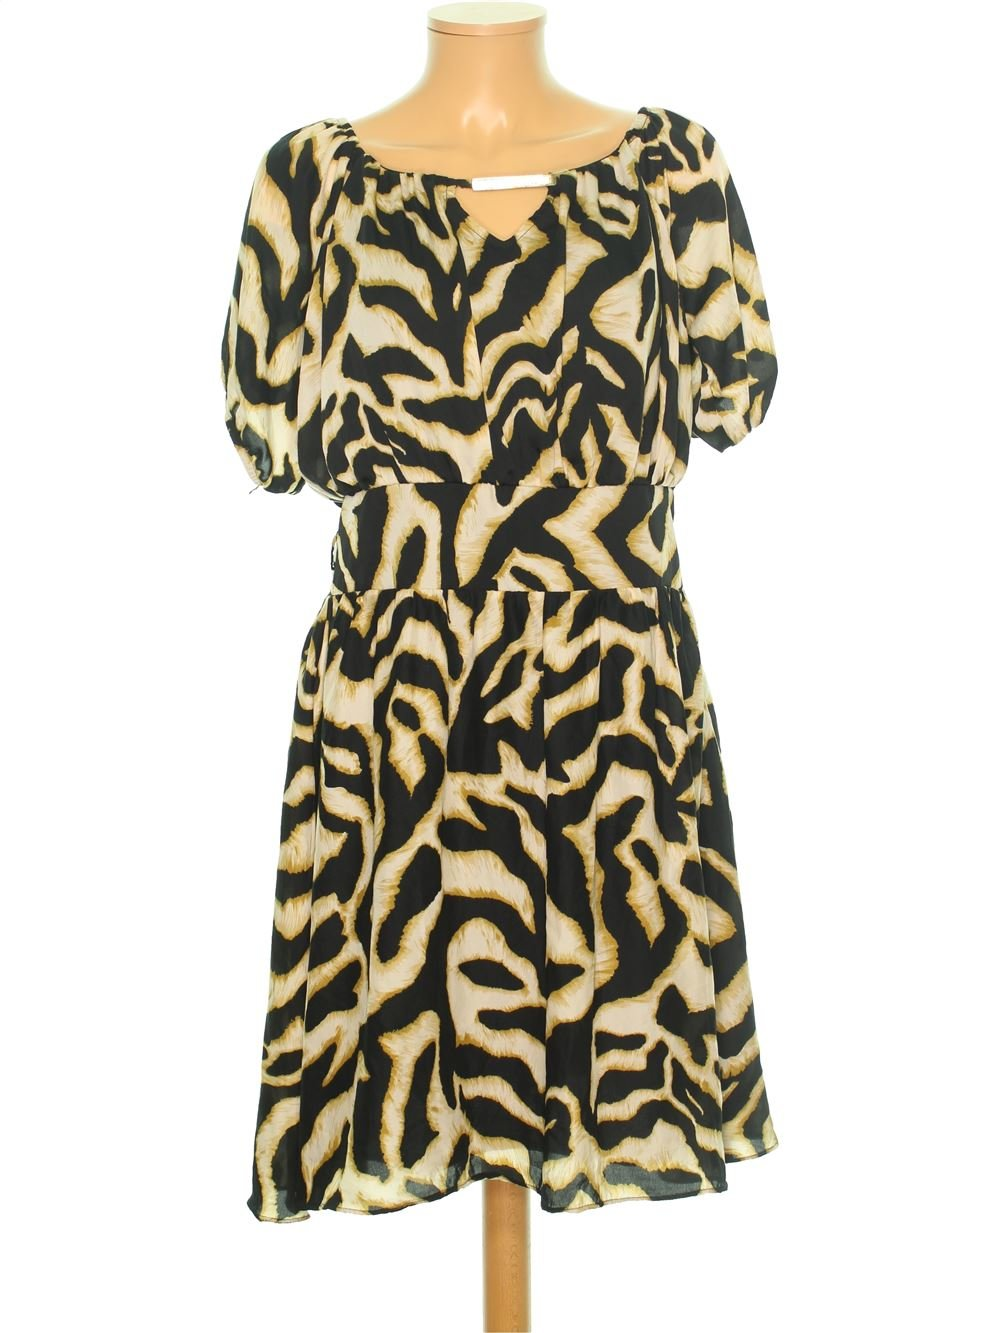 Cher7 Robe 42l Femme 99 €1701187 T2Pas Bodyform TKlFc1J